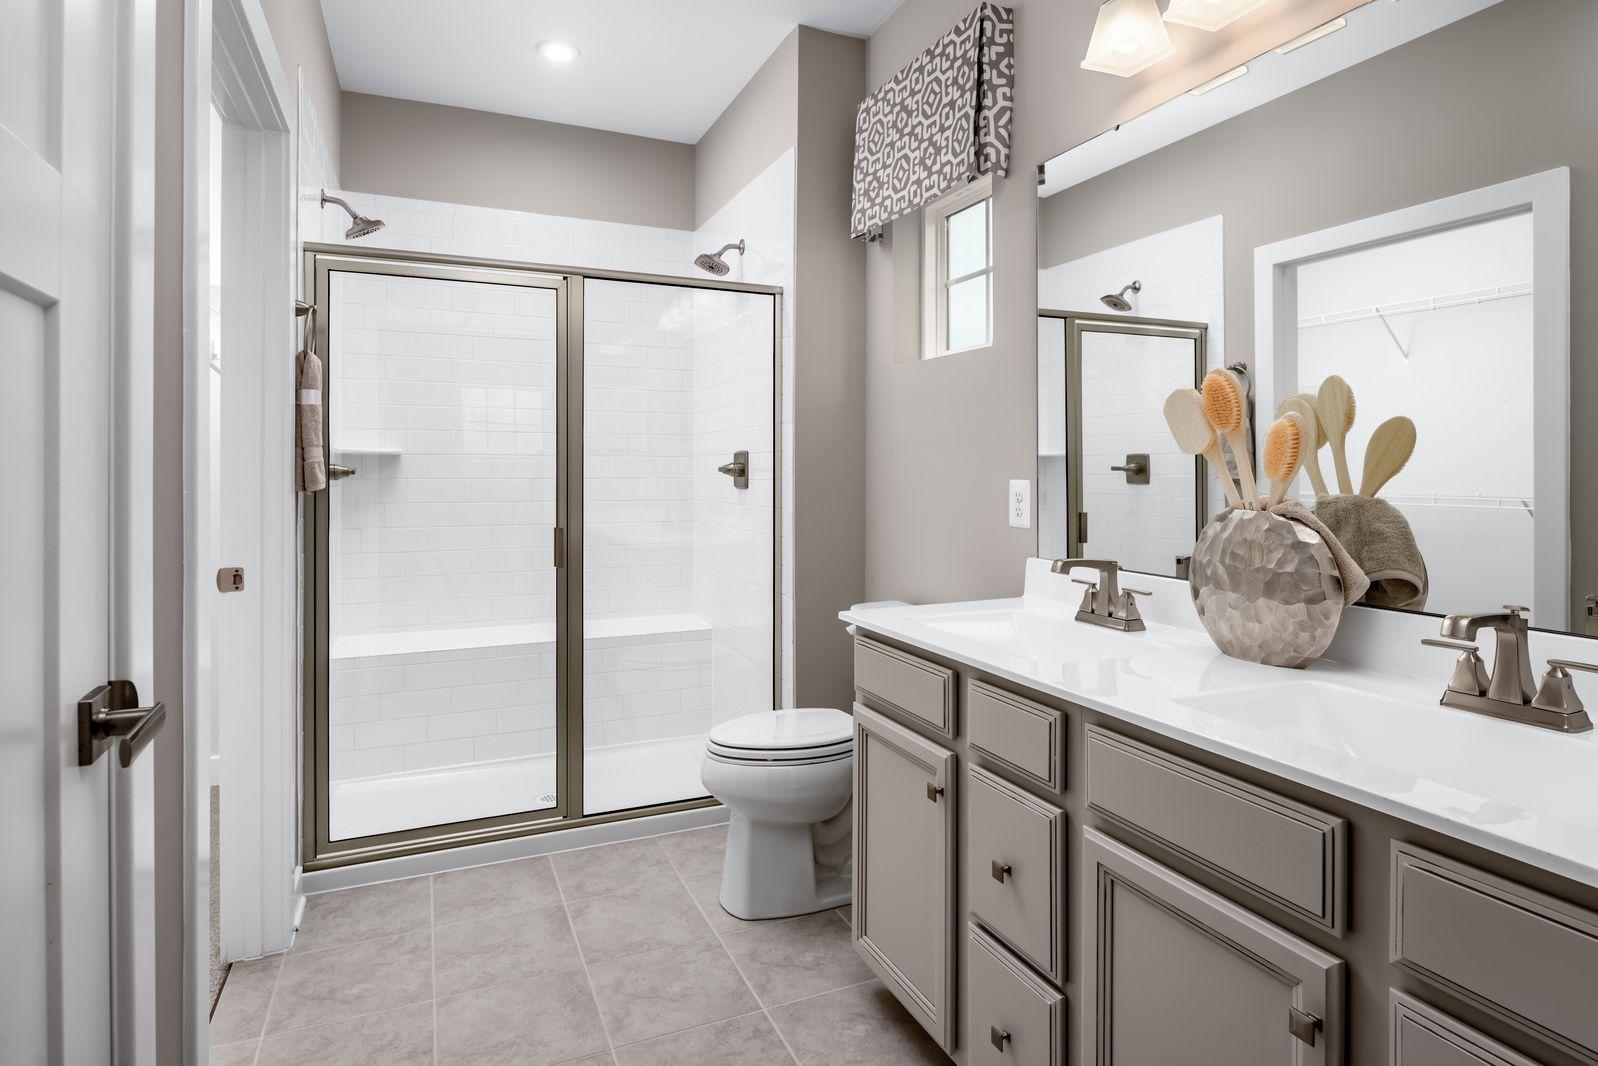 Bathroom featured in the Alberti Ranch By Ryan Homes in Wilmington-Newark, DE